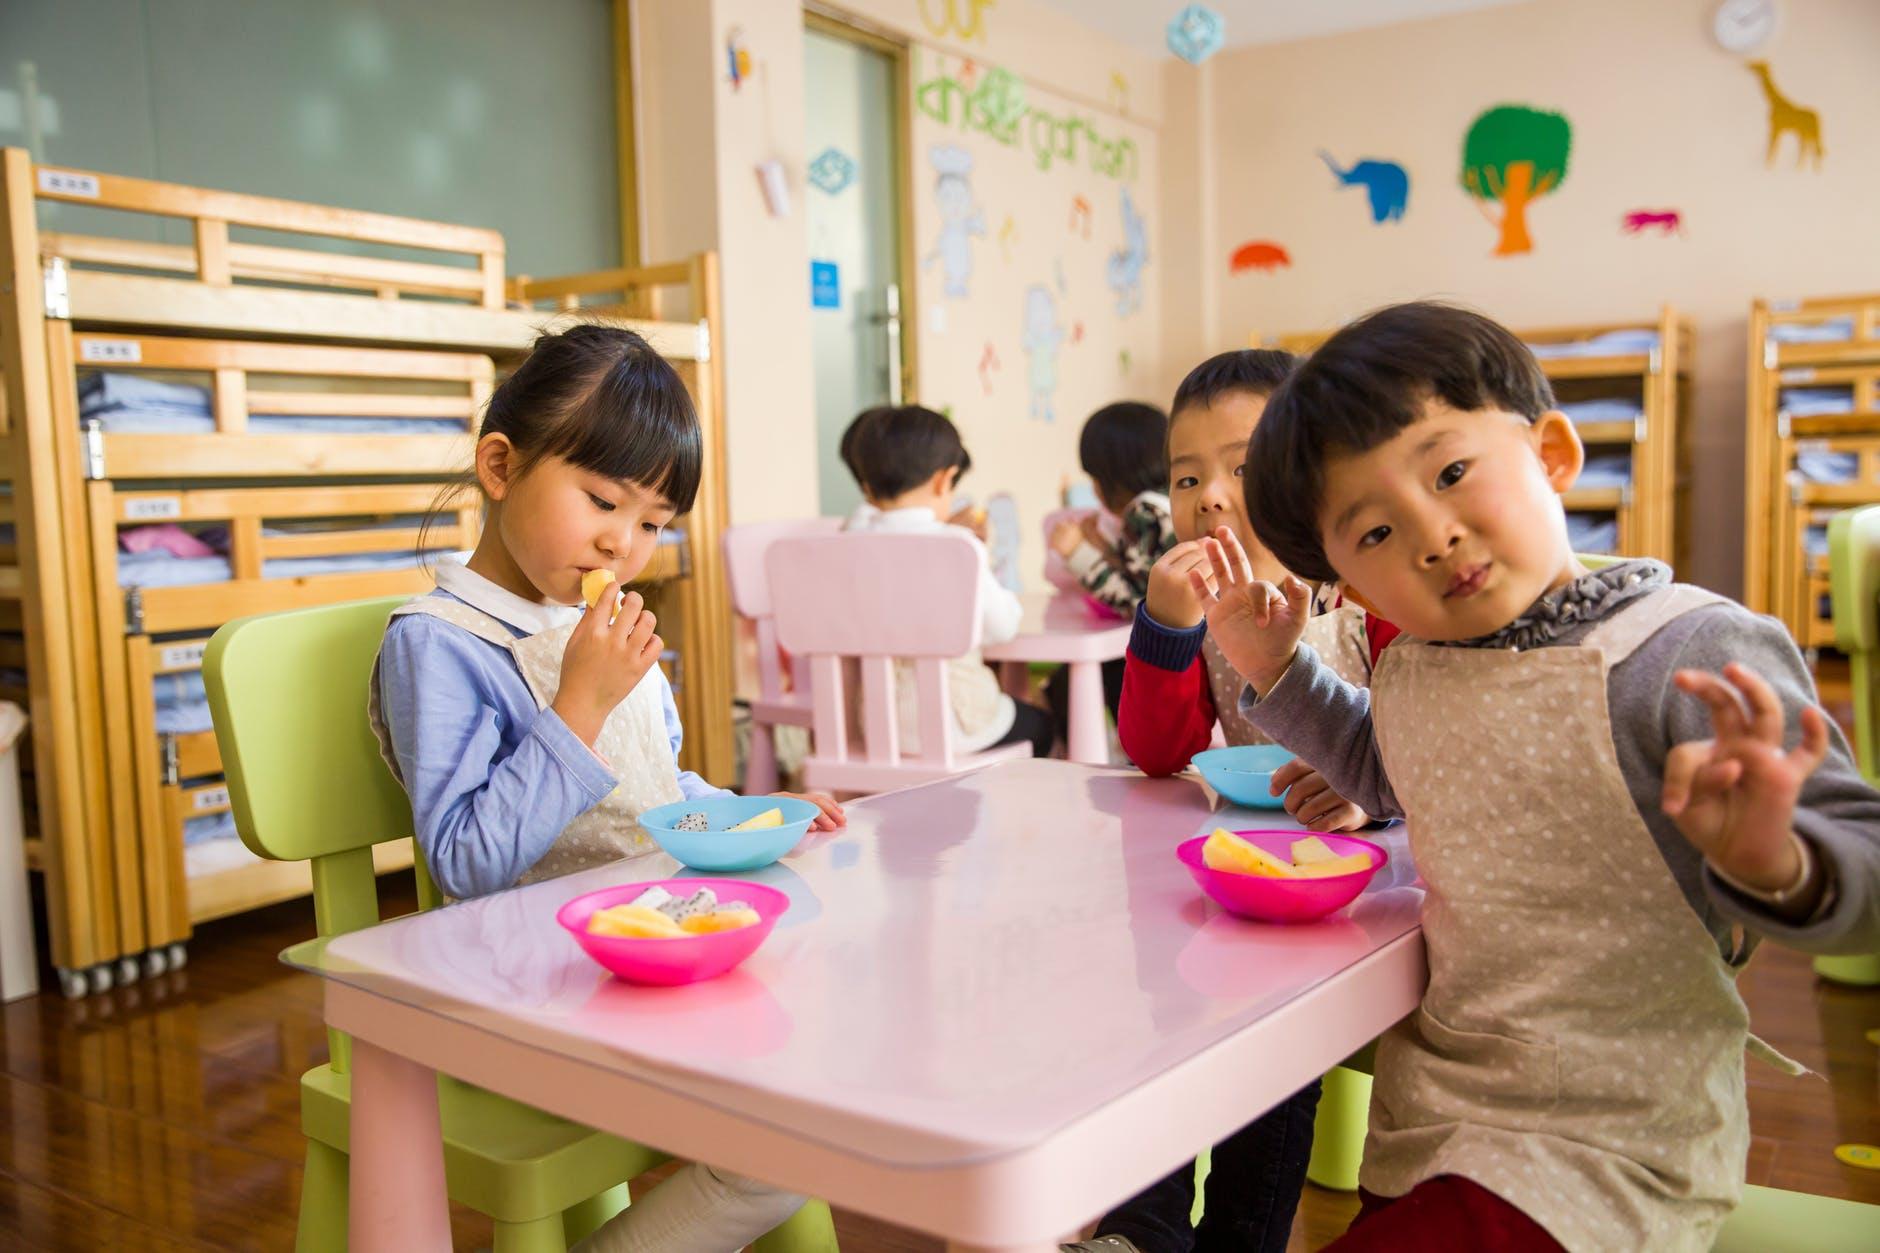 Should you send your child to a Montessori school